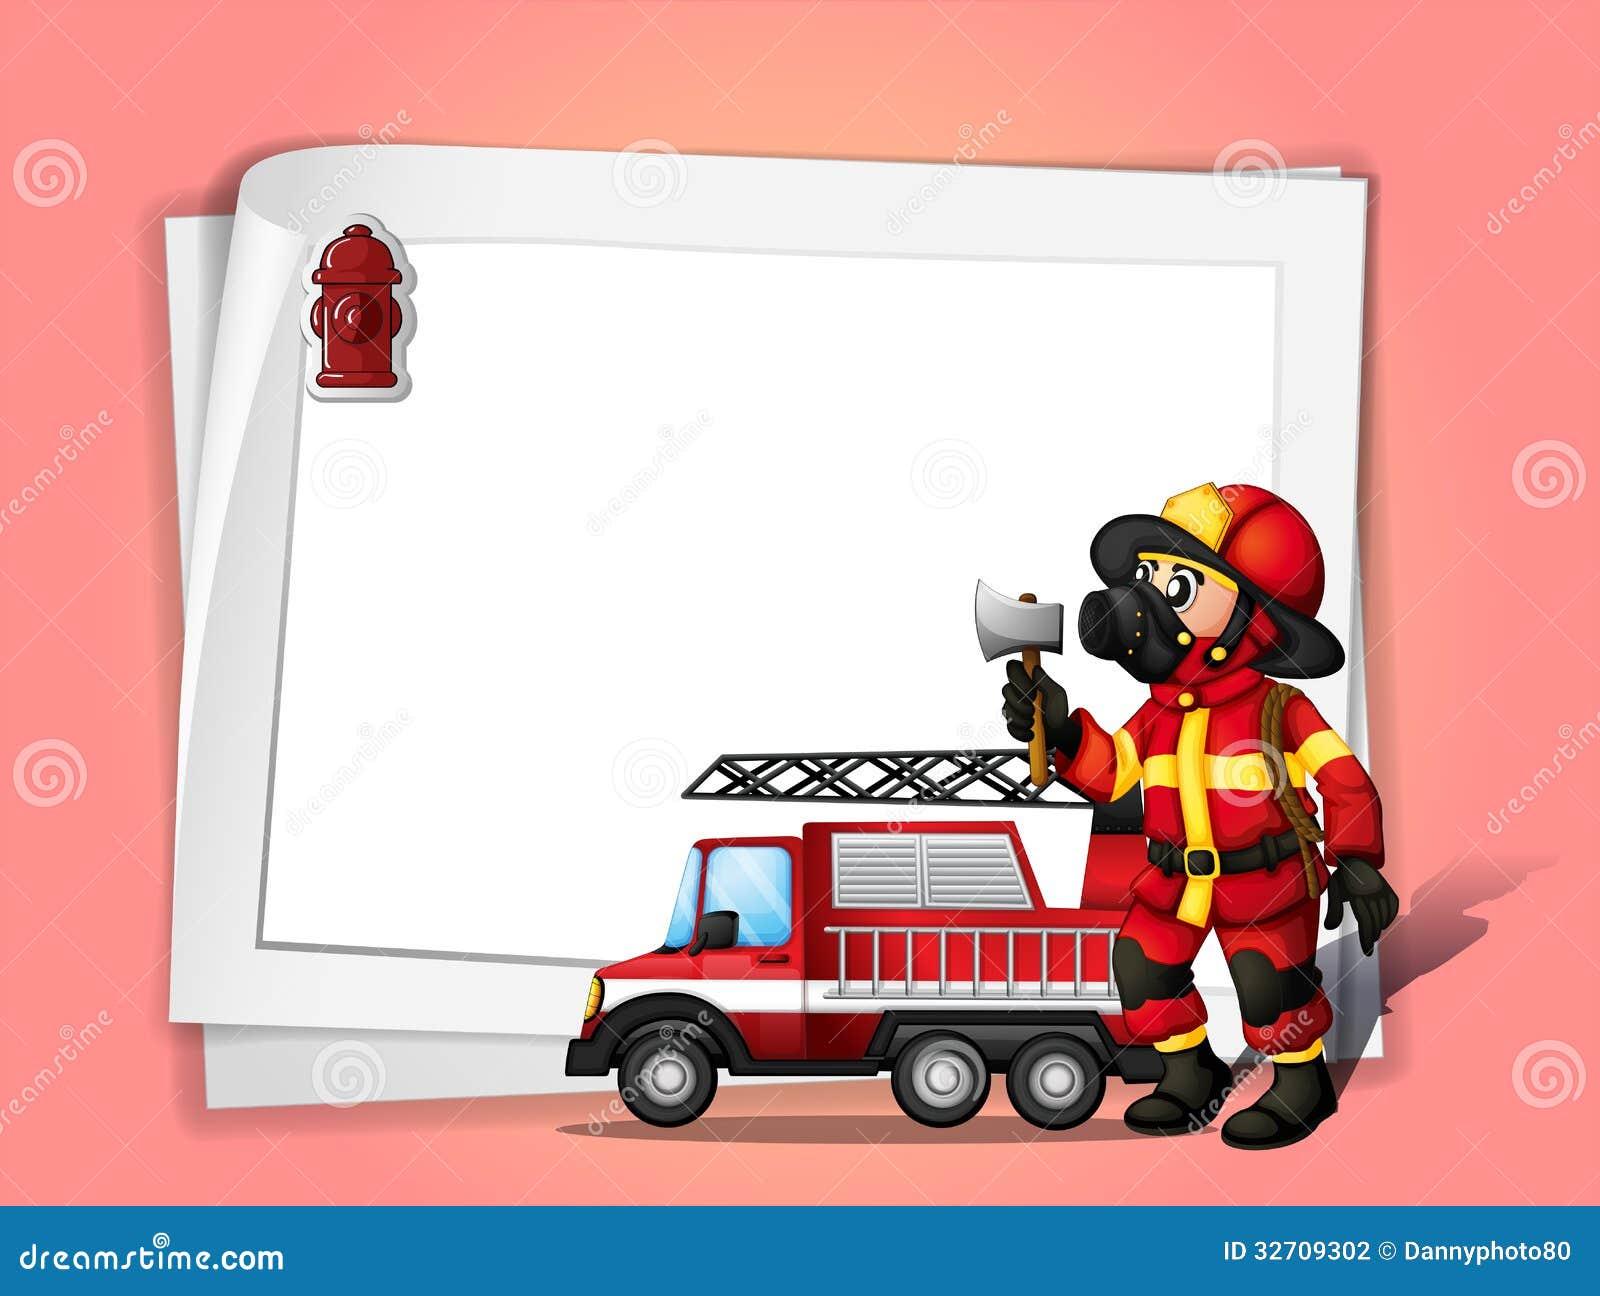 a fireman holding an ax beside his fire truck with a white Firefighters Fireman Clip Art fireman clipart pictures